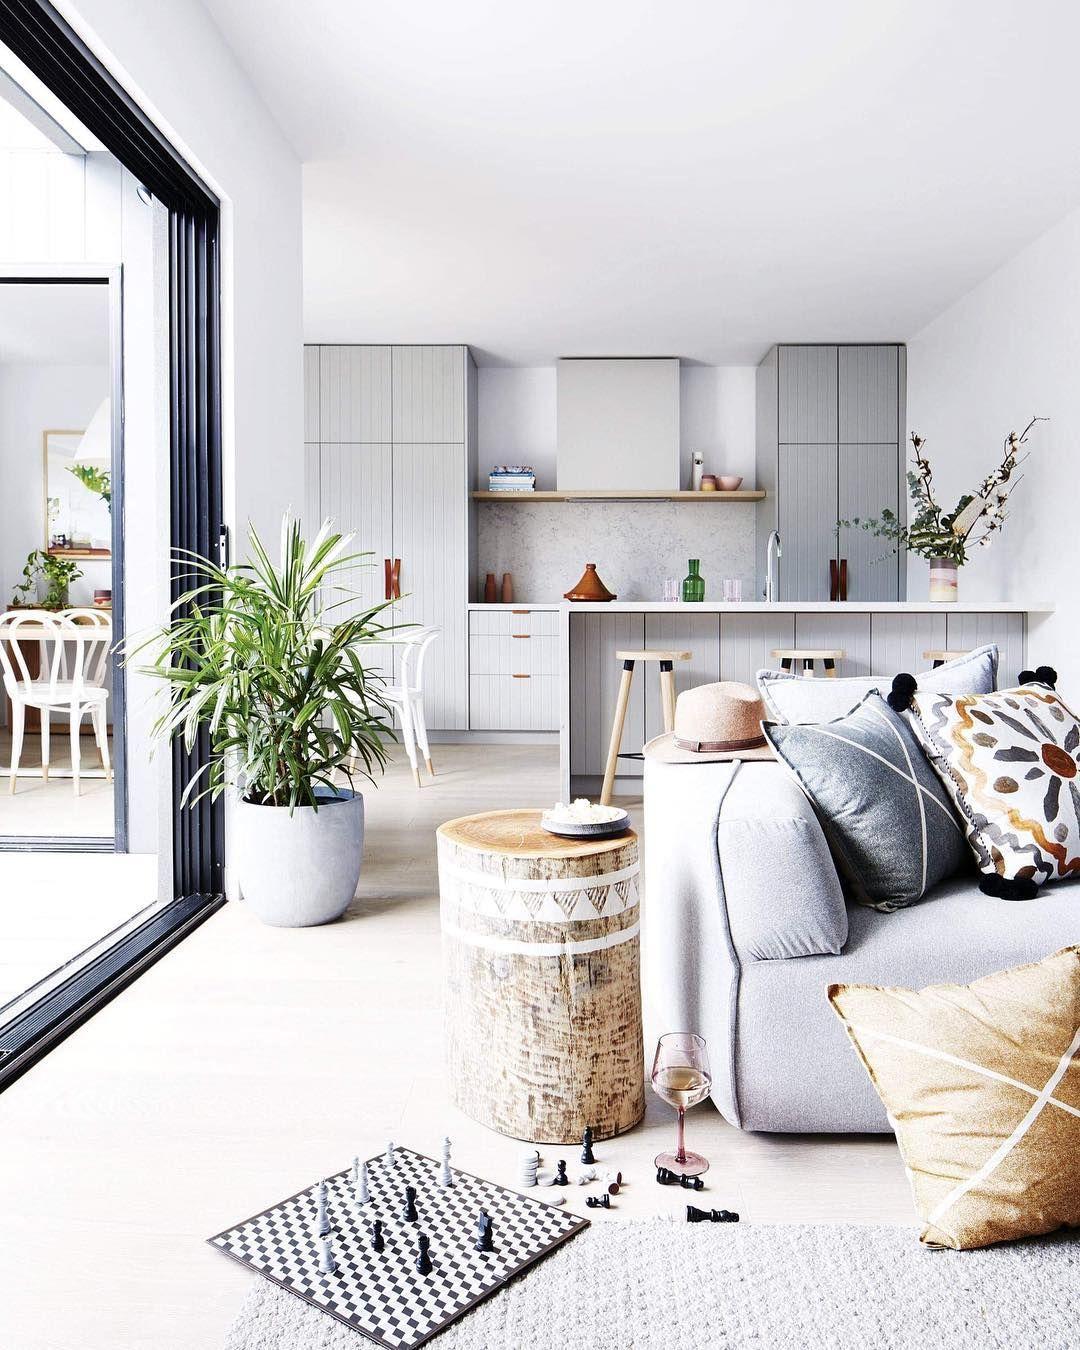 Cool Living Room Interior Design: Home Interior Design, Living Room Designs